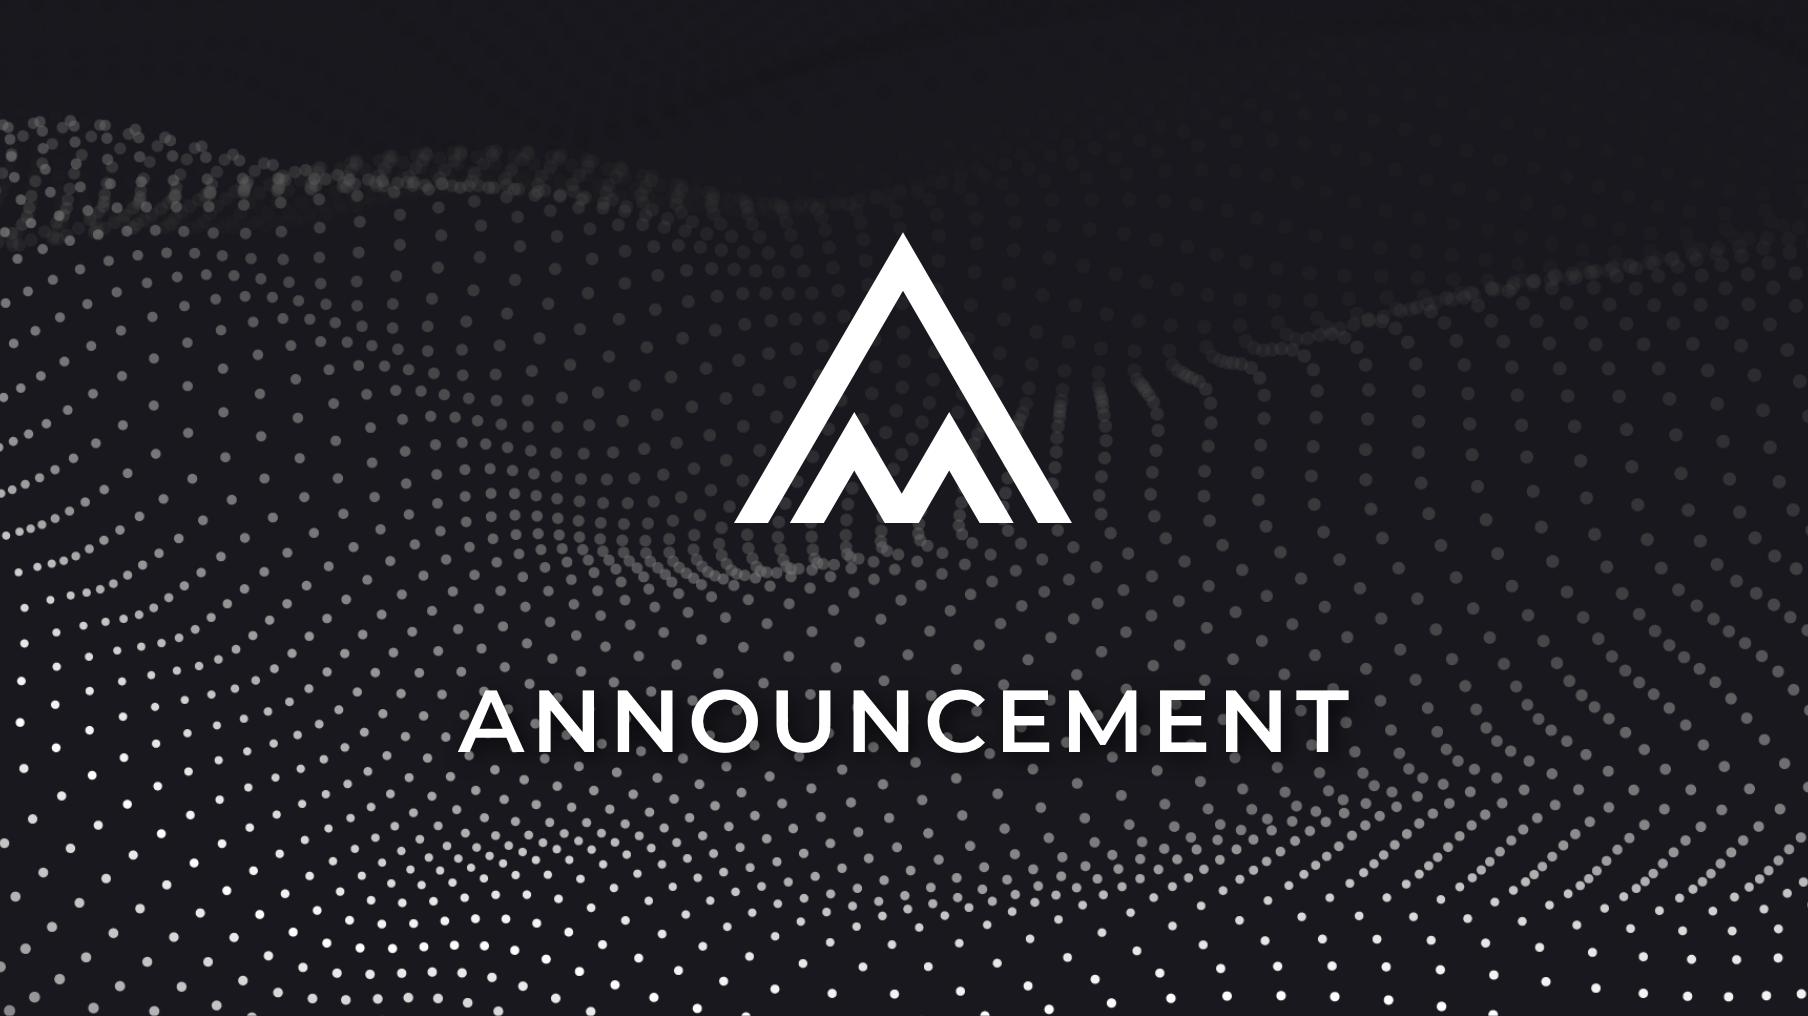 Mawson_Announcement_Cover